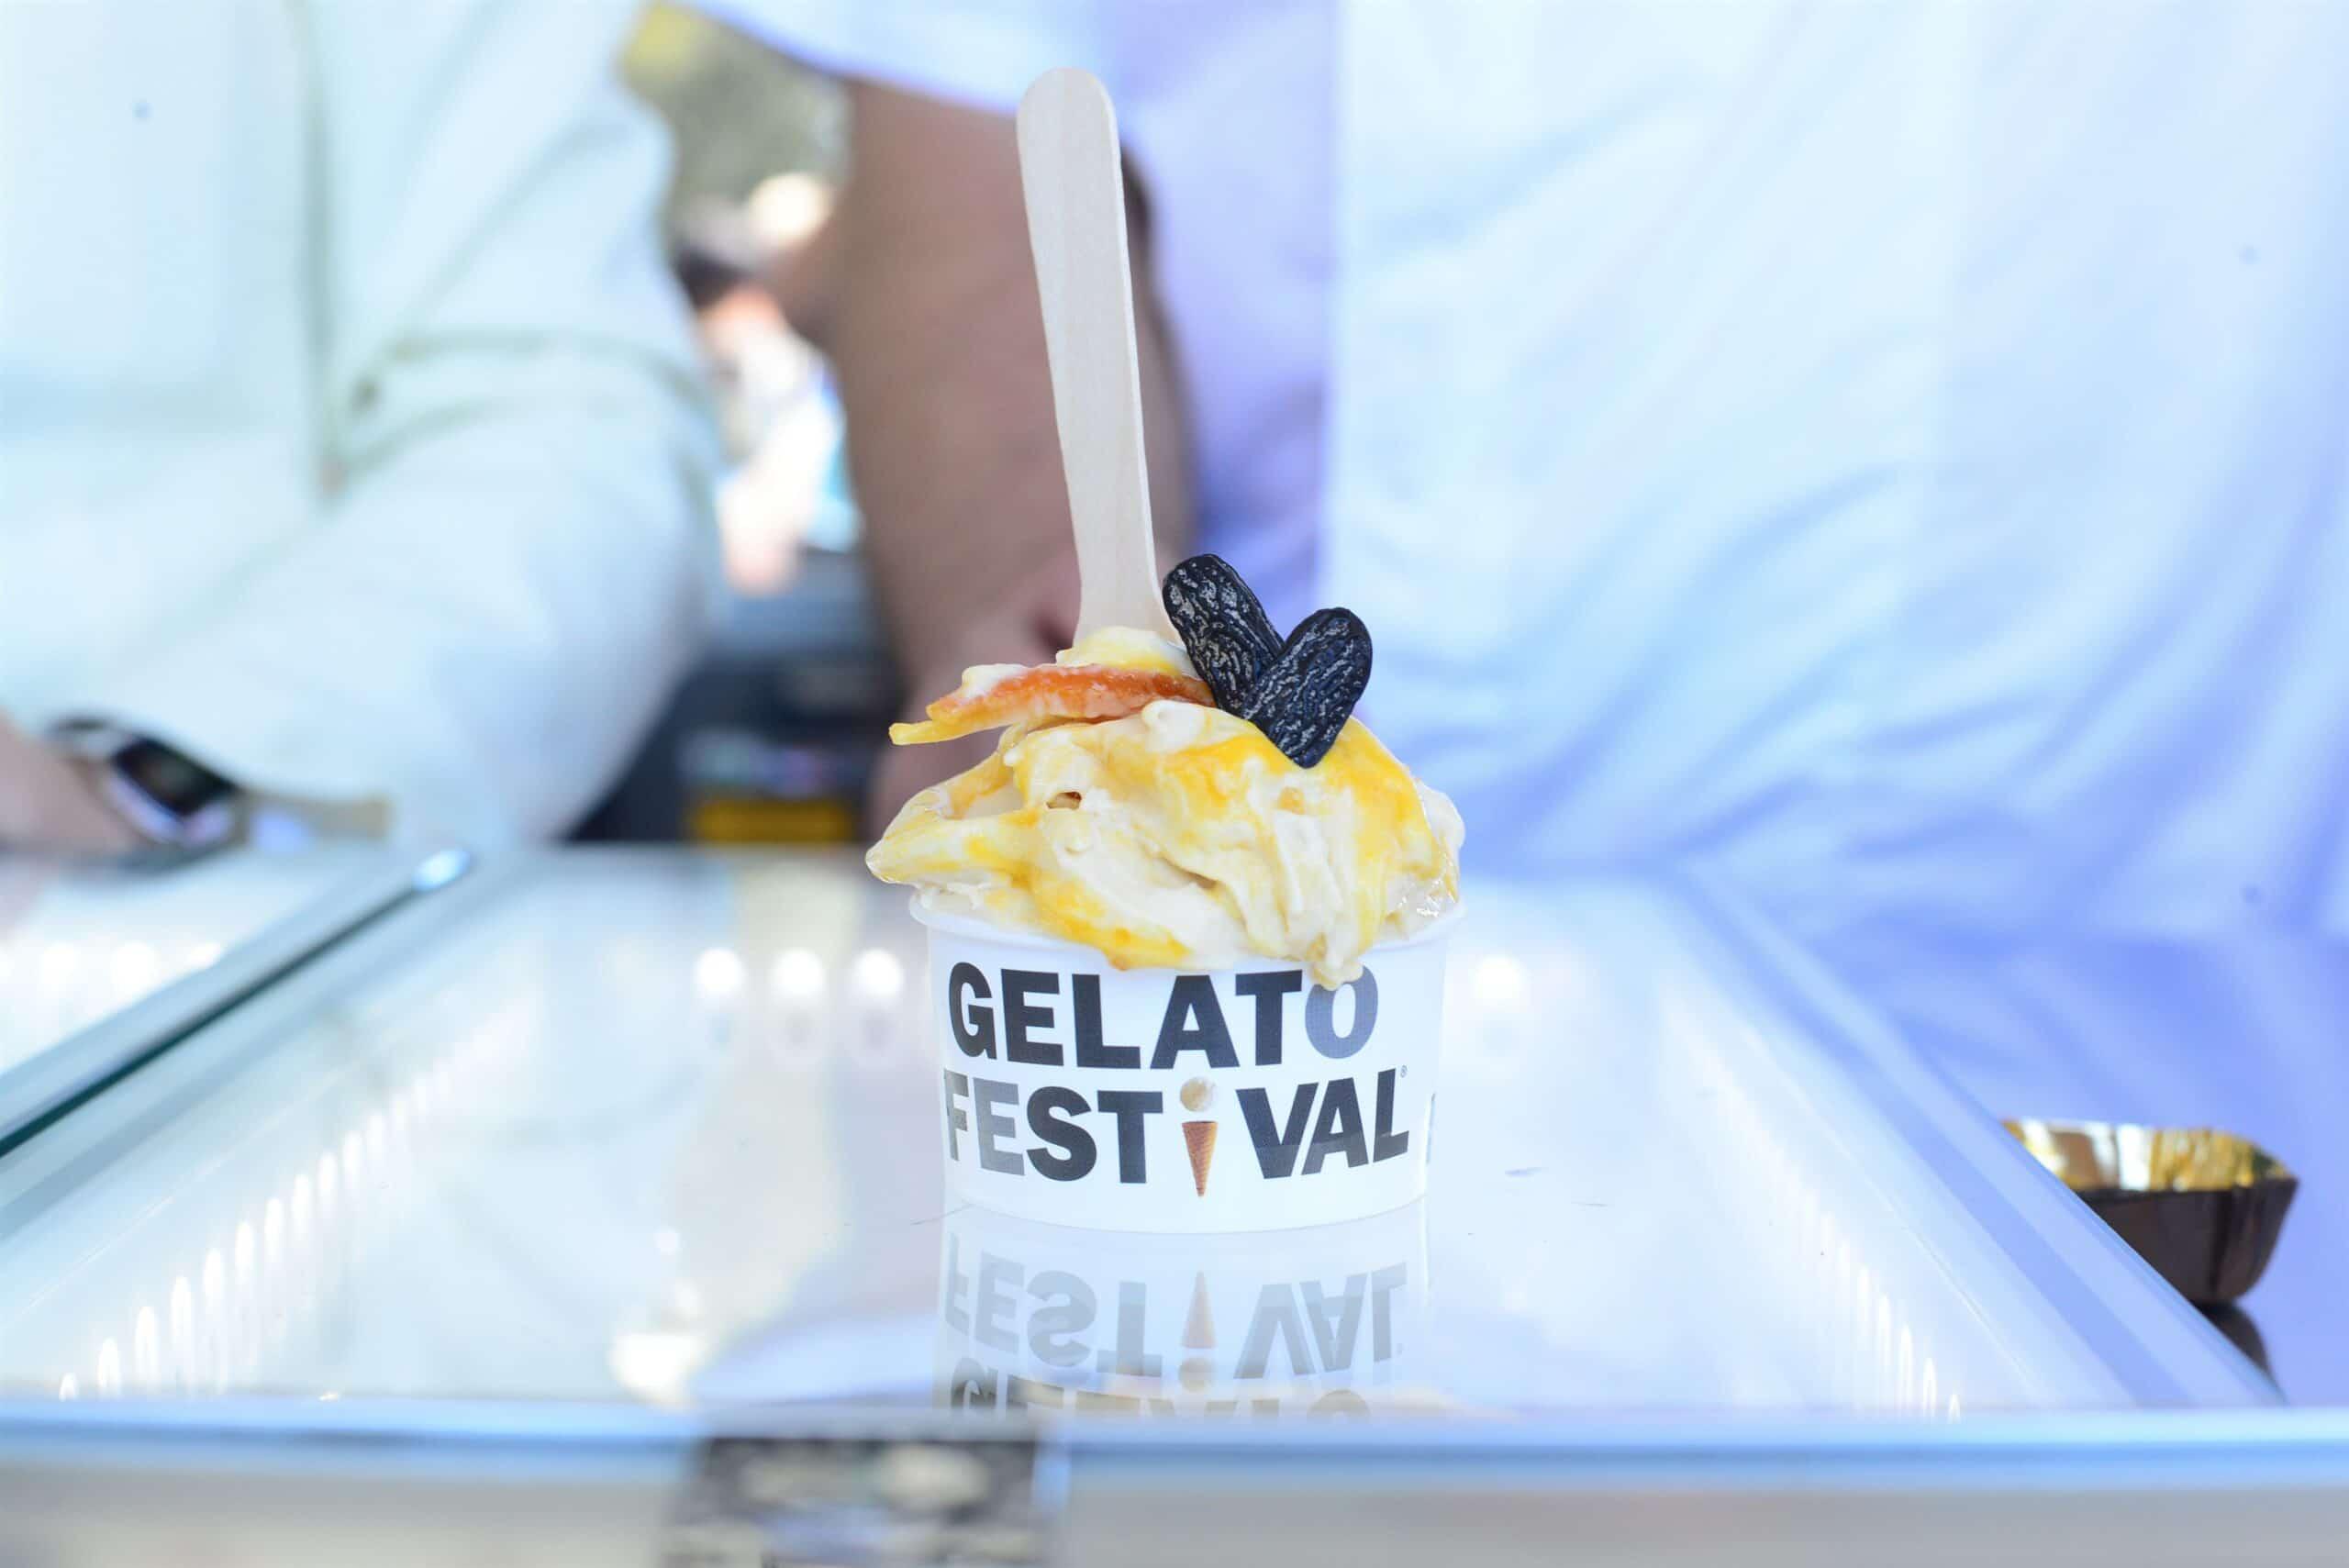 Photo of Torna Gelato Festival 2018, a Firenze dal 20 al 22 aprile al Piazzale Michelangelo